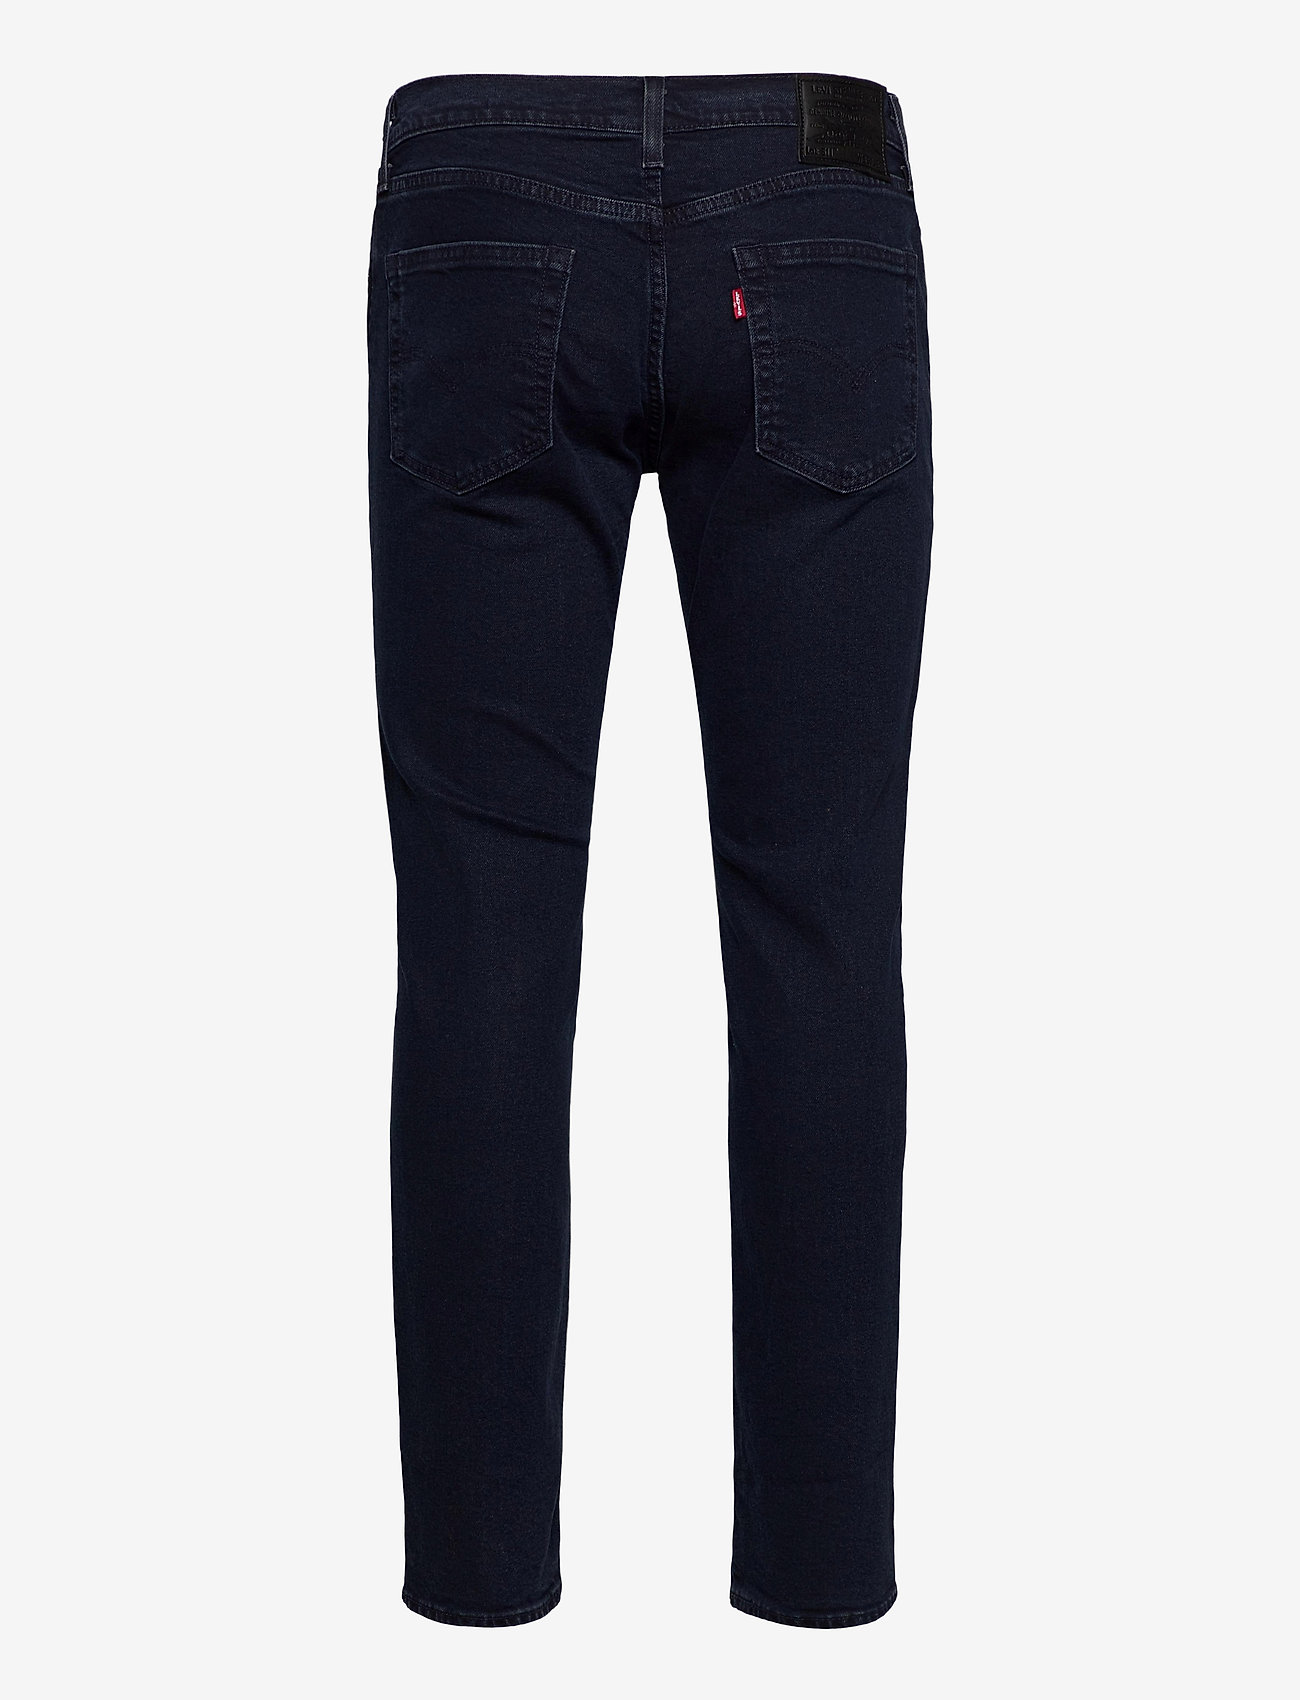 LEVI´S Men - 511 SLIM POP POP T2 - slim jeans - dark indigo - worn in - 1